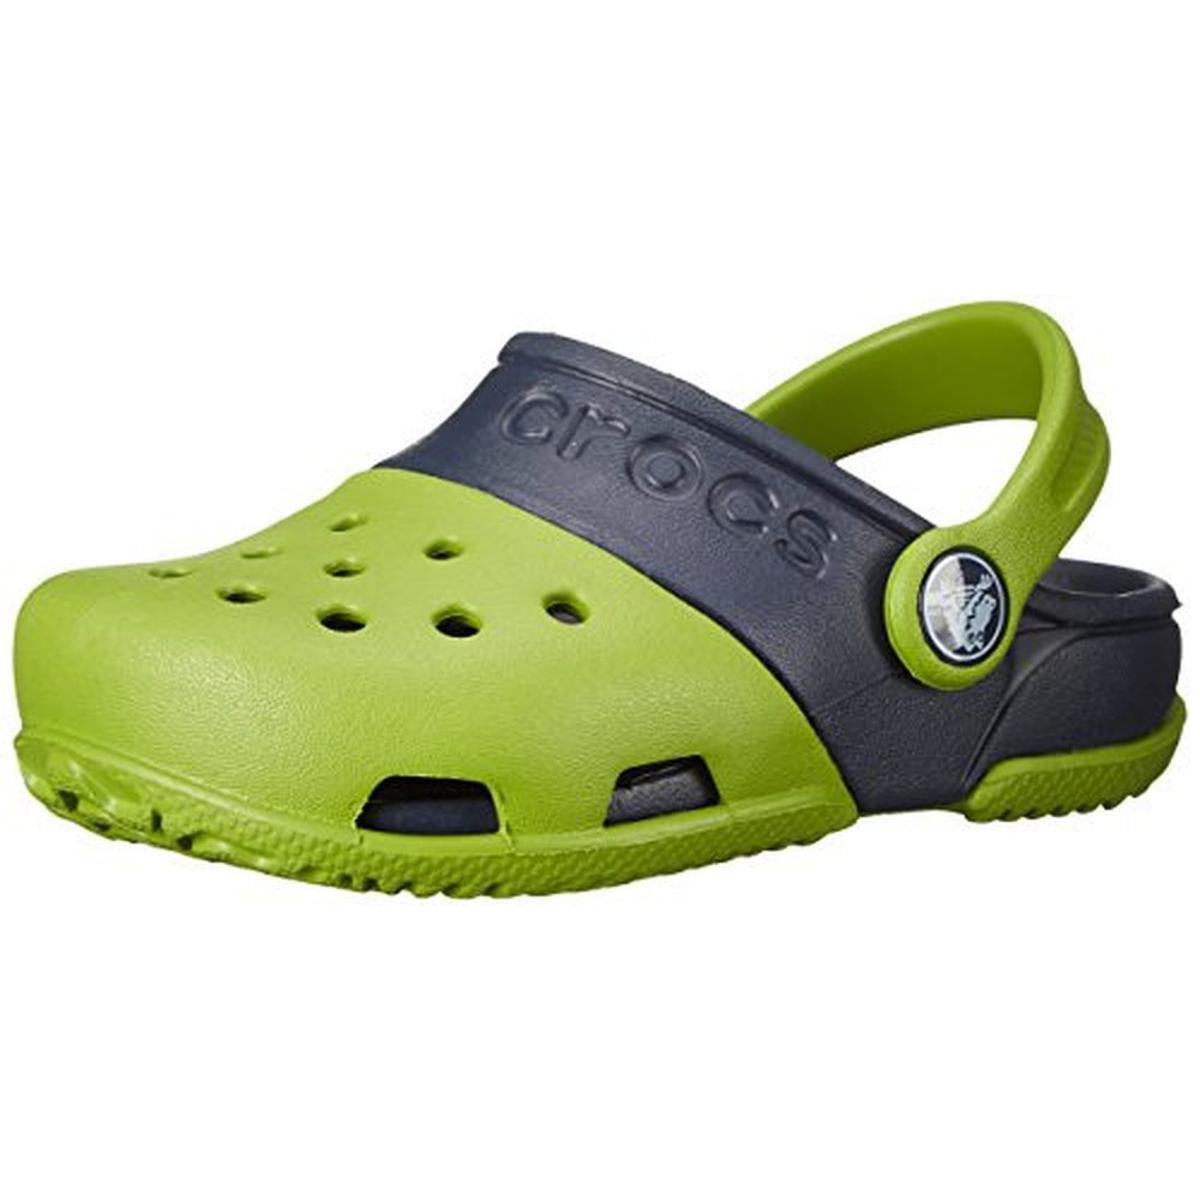 Crocs Electro II Colorblock Clogs by Crocs